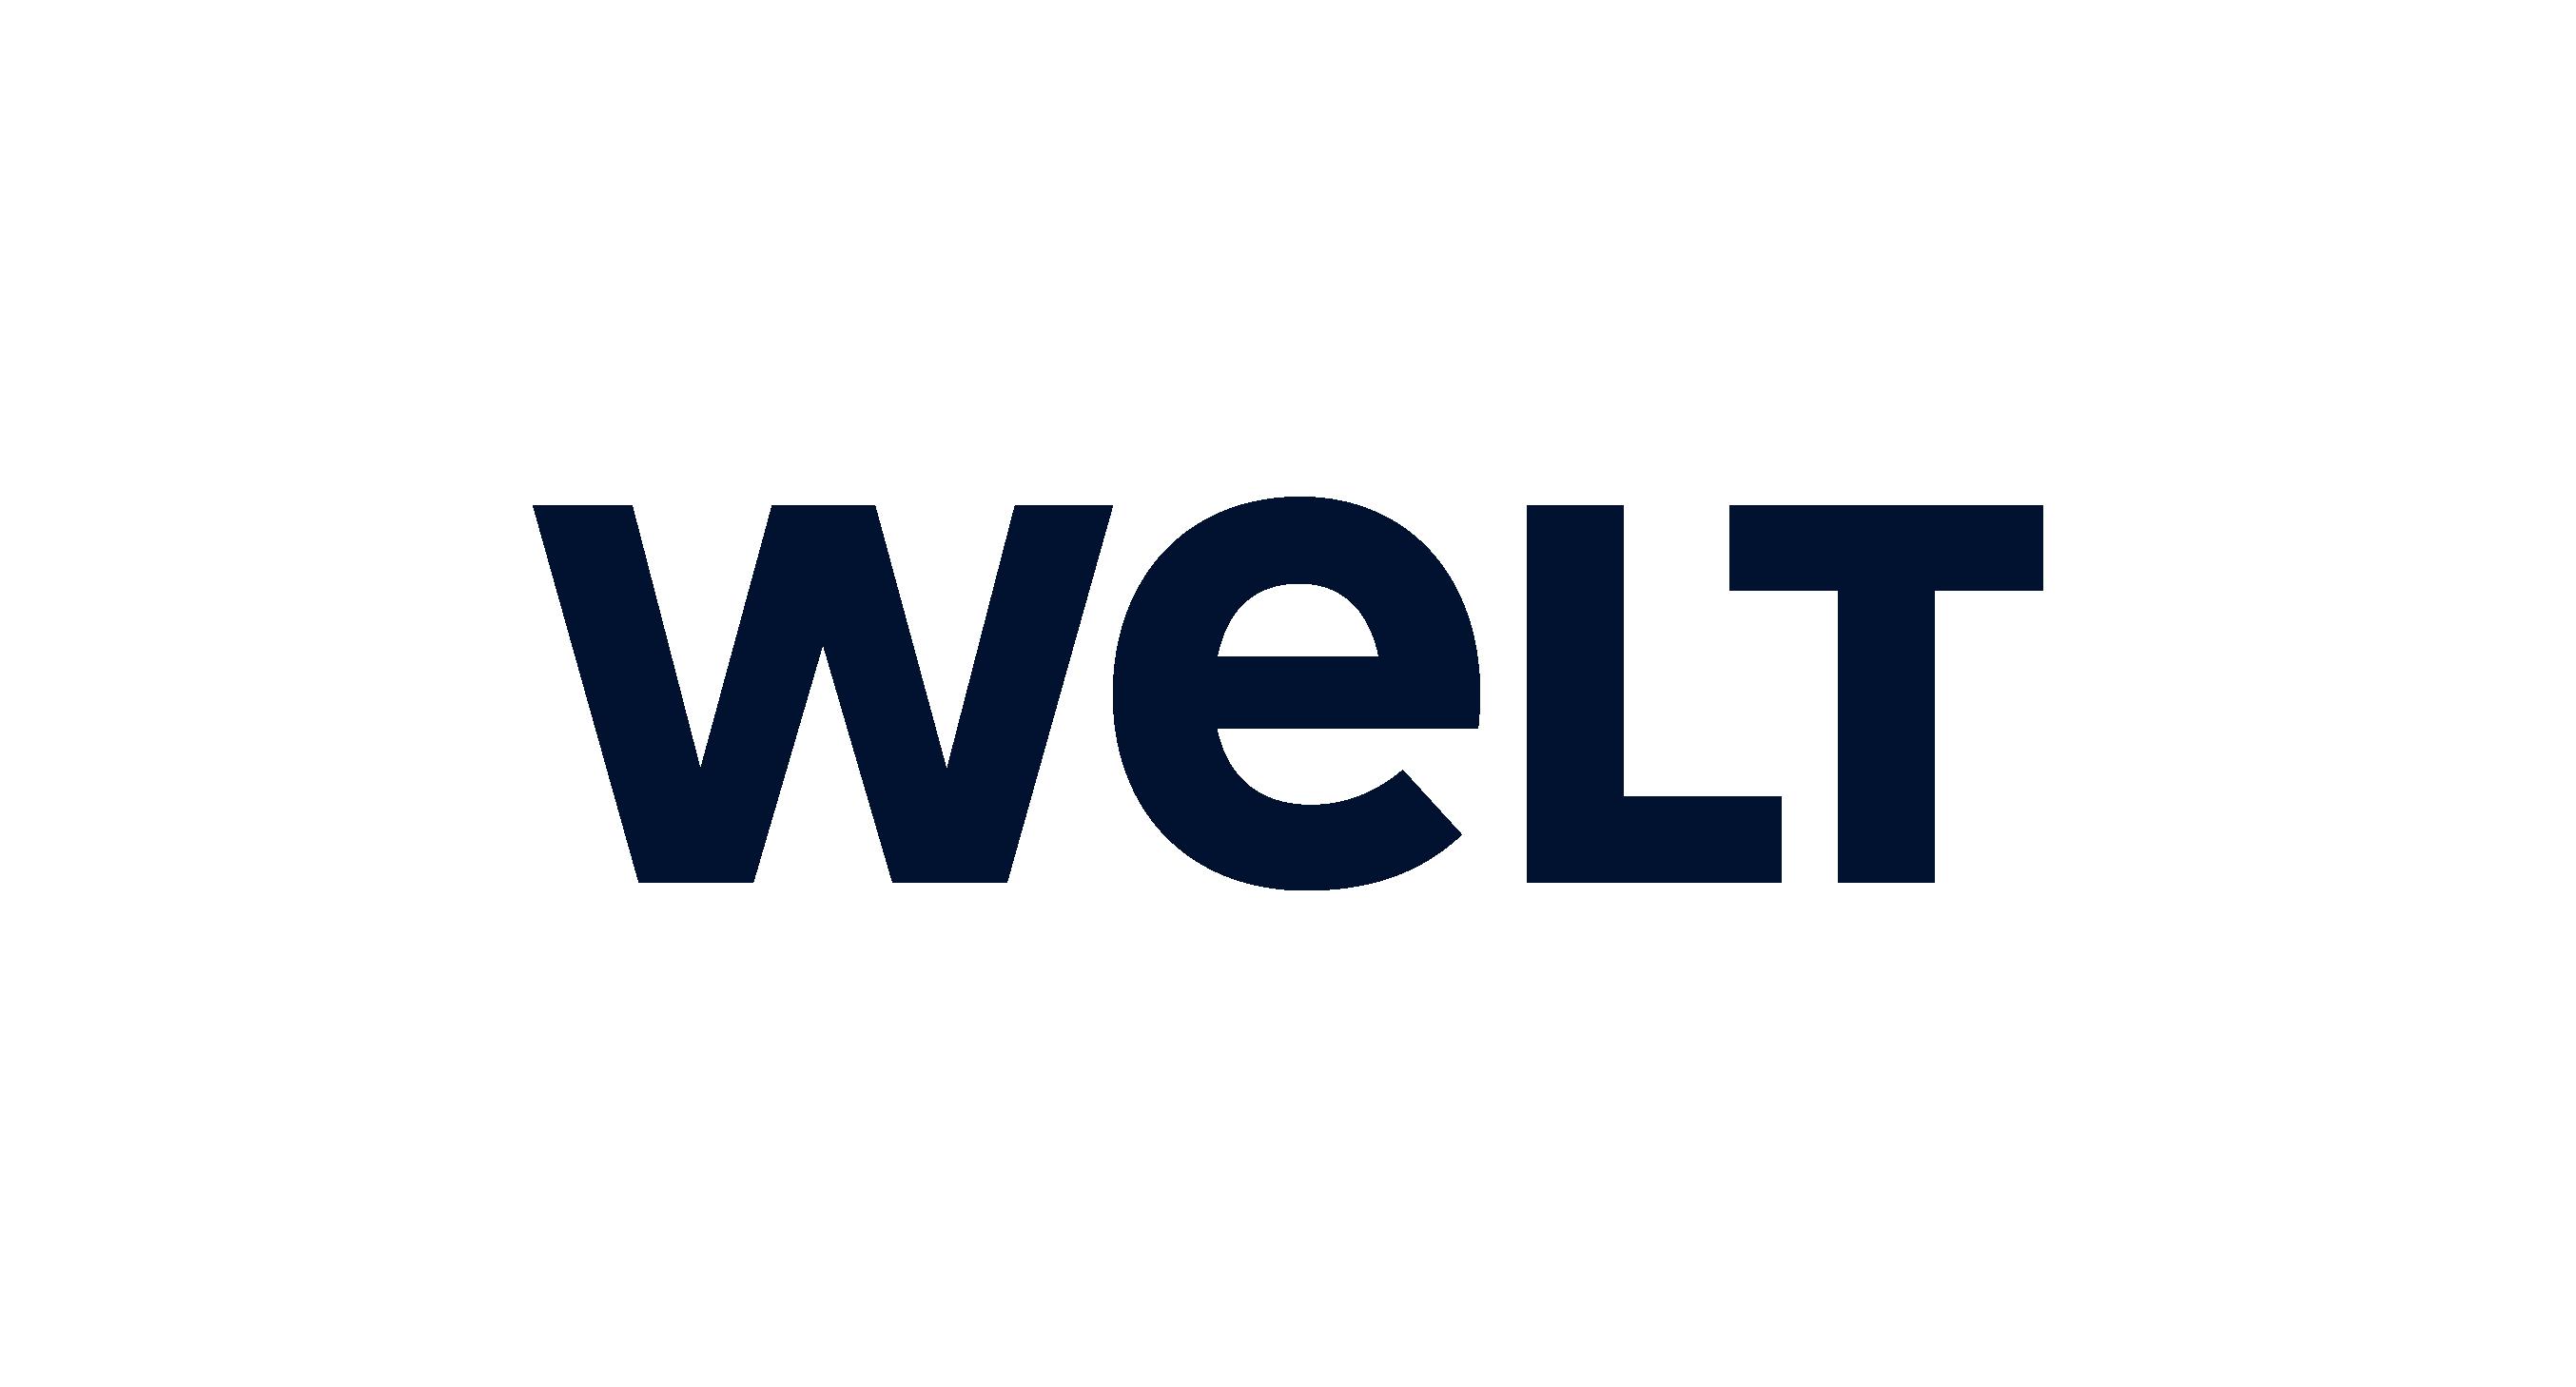 Welt logo blue